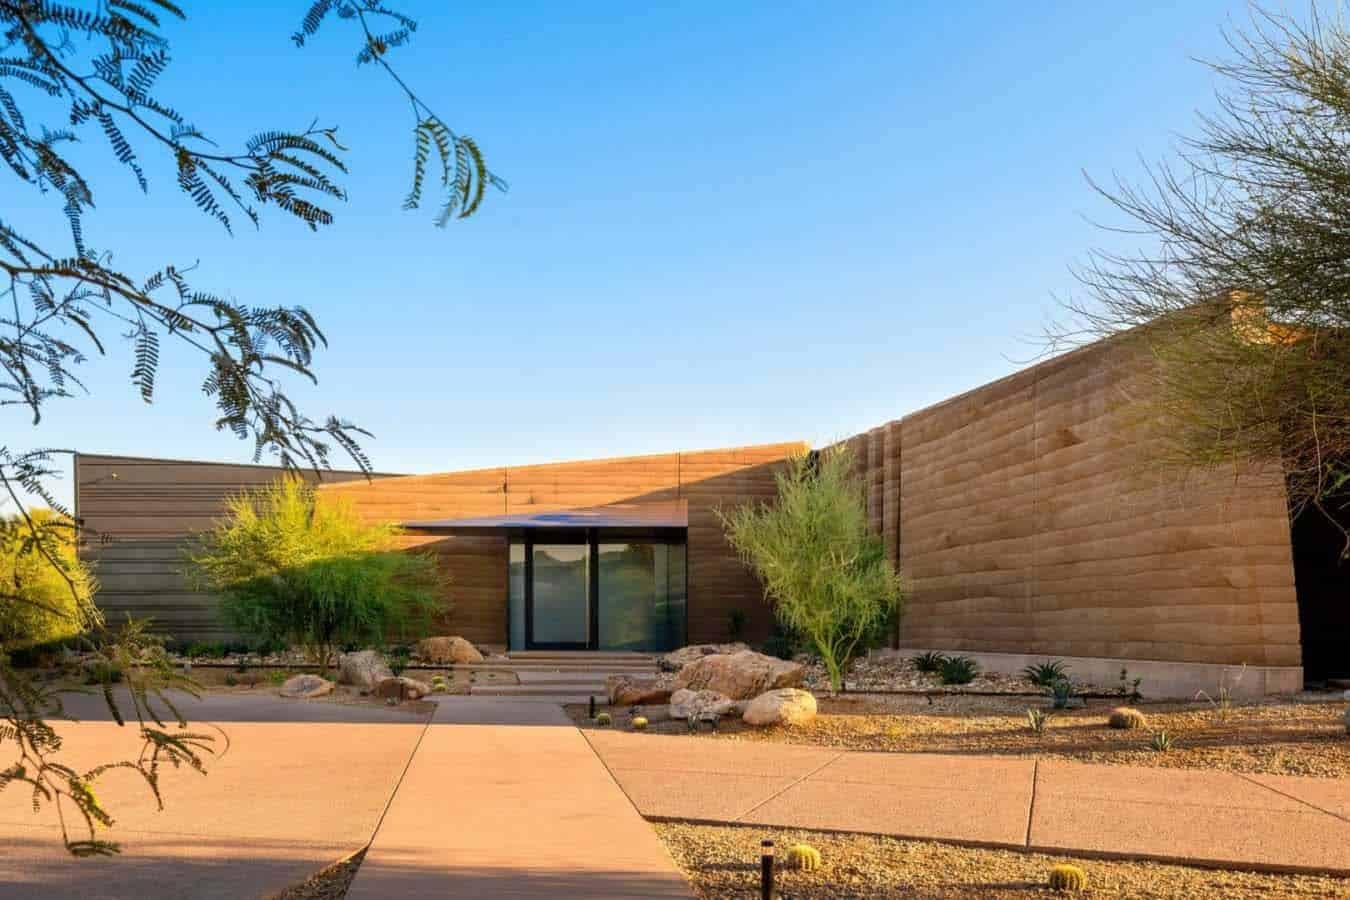 desert-modern-home-exterior